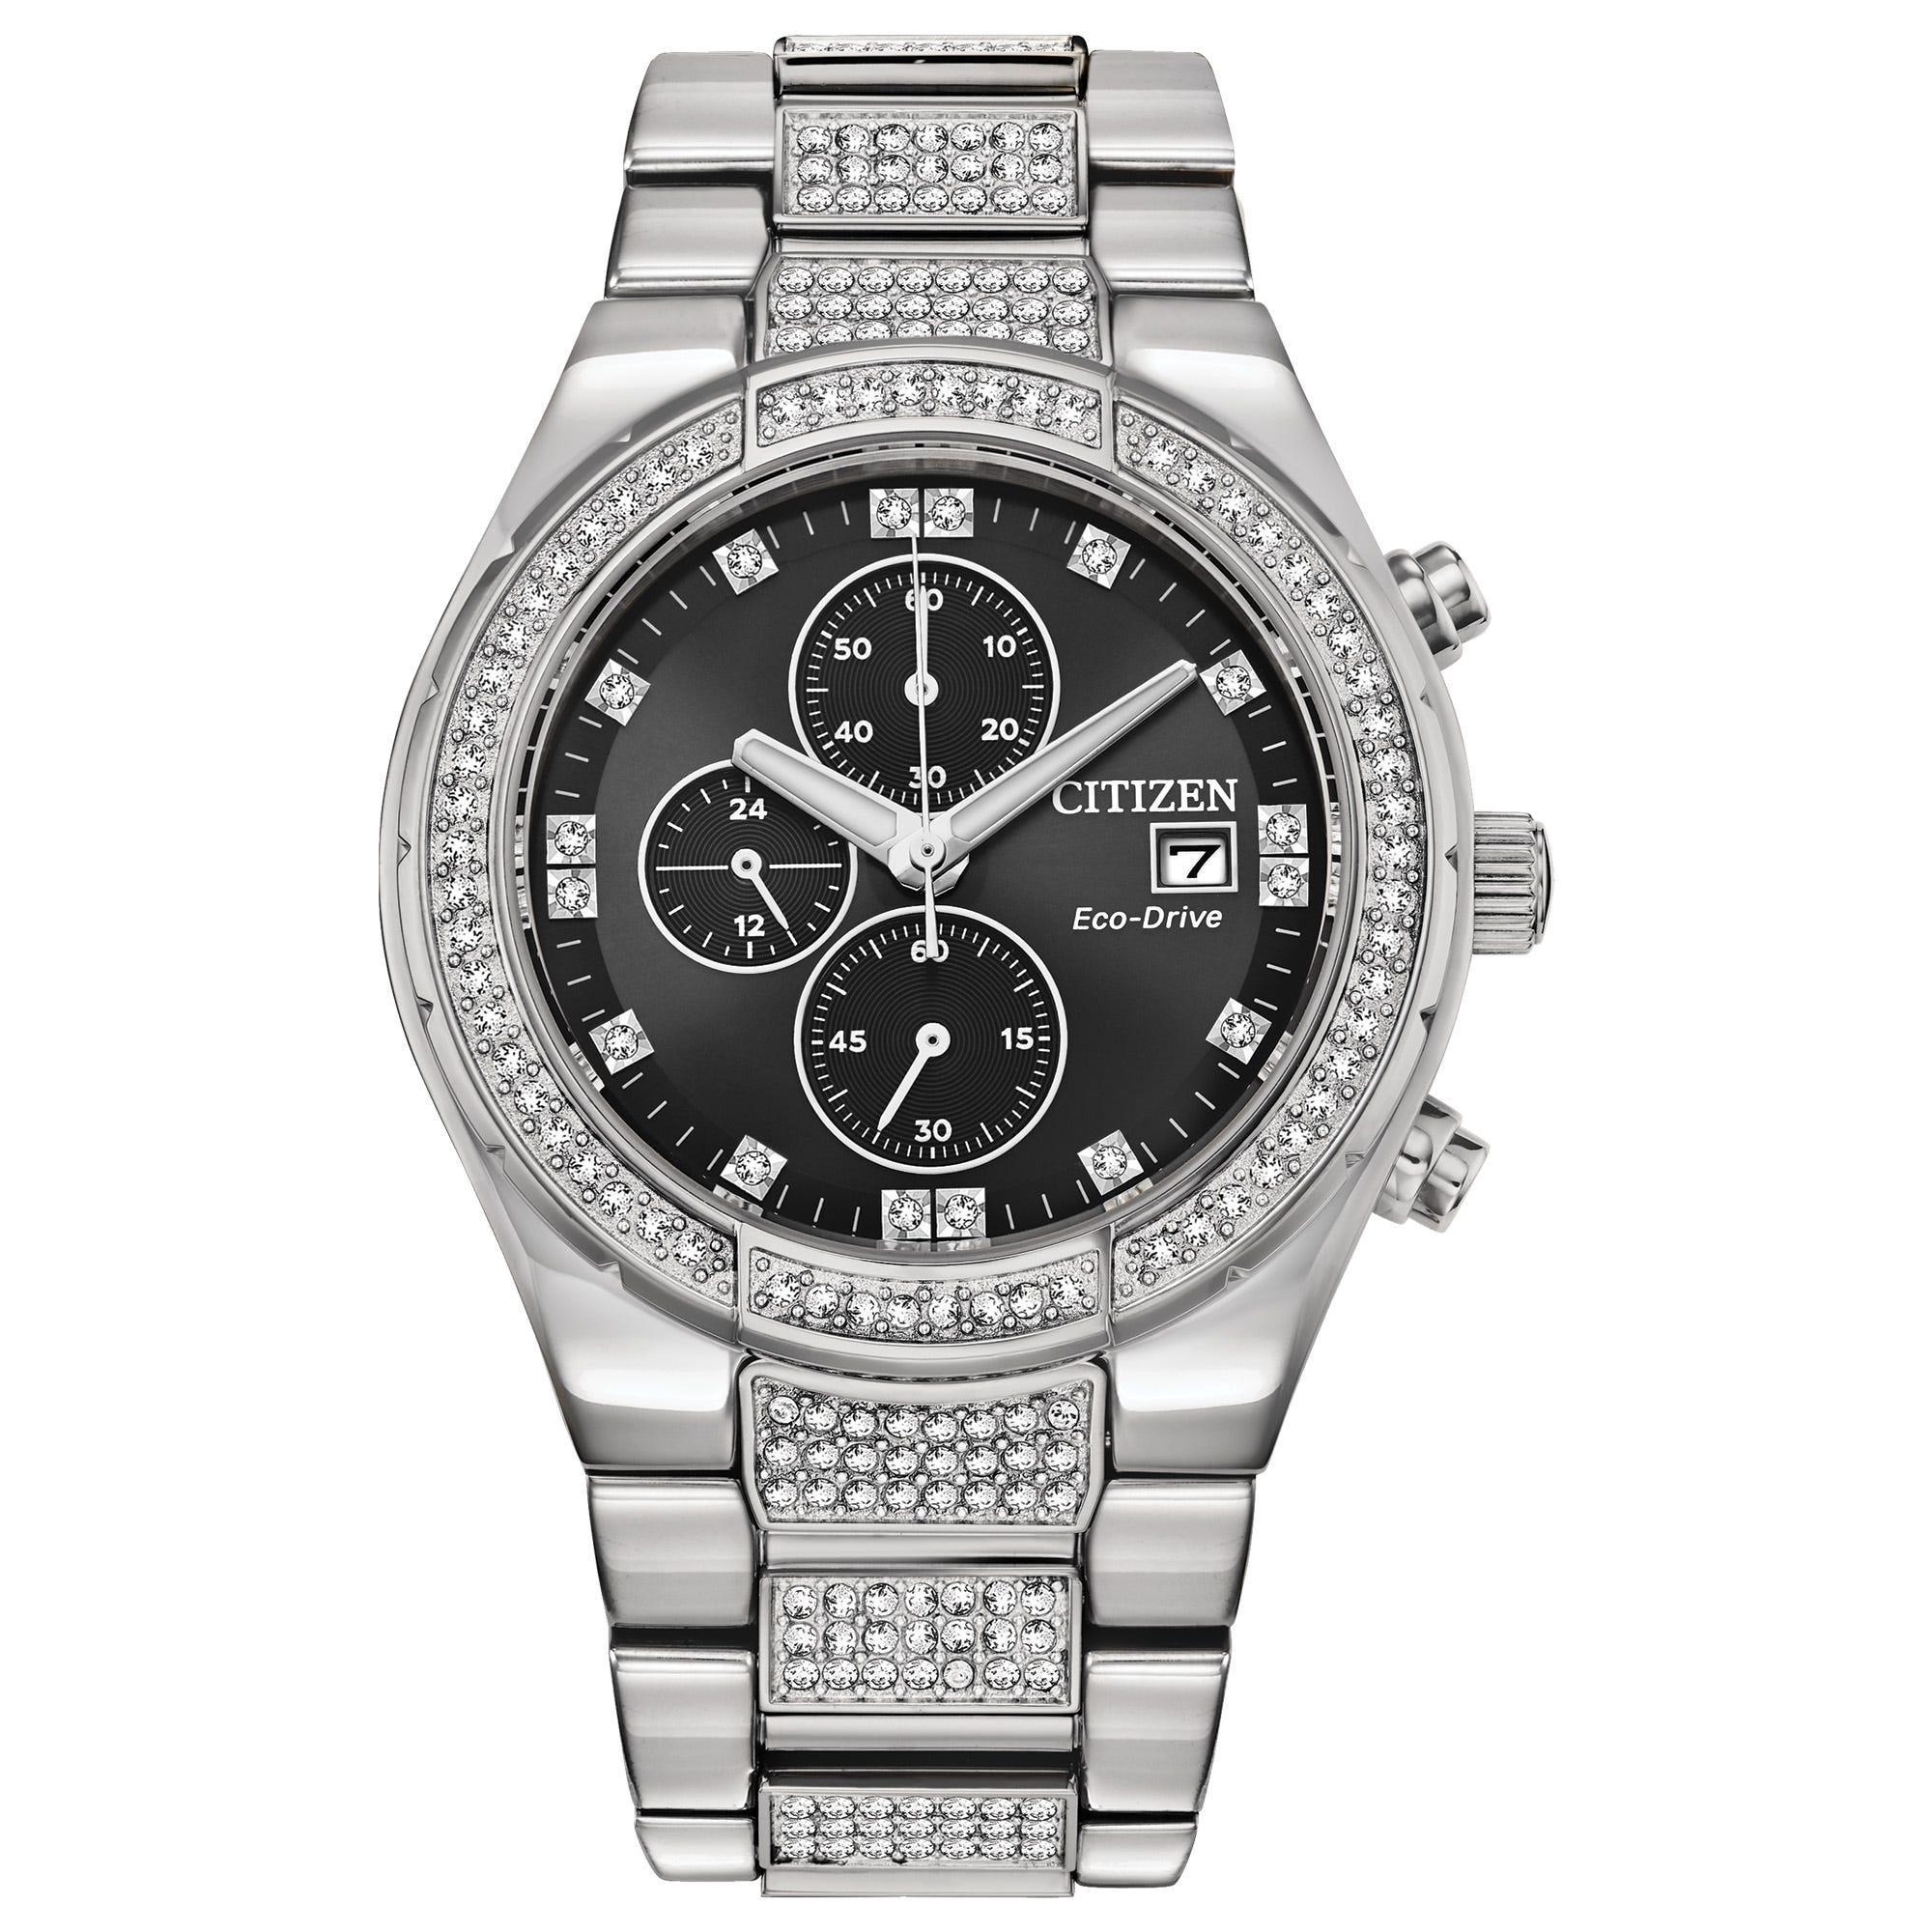 Citizen Men's Eco-Drive Crystal Watch CA0750-53E